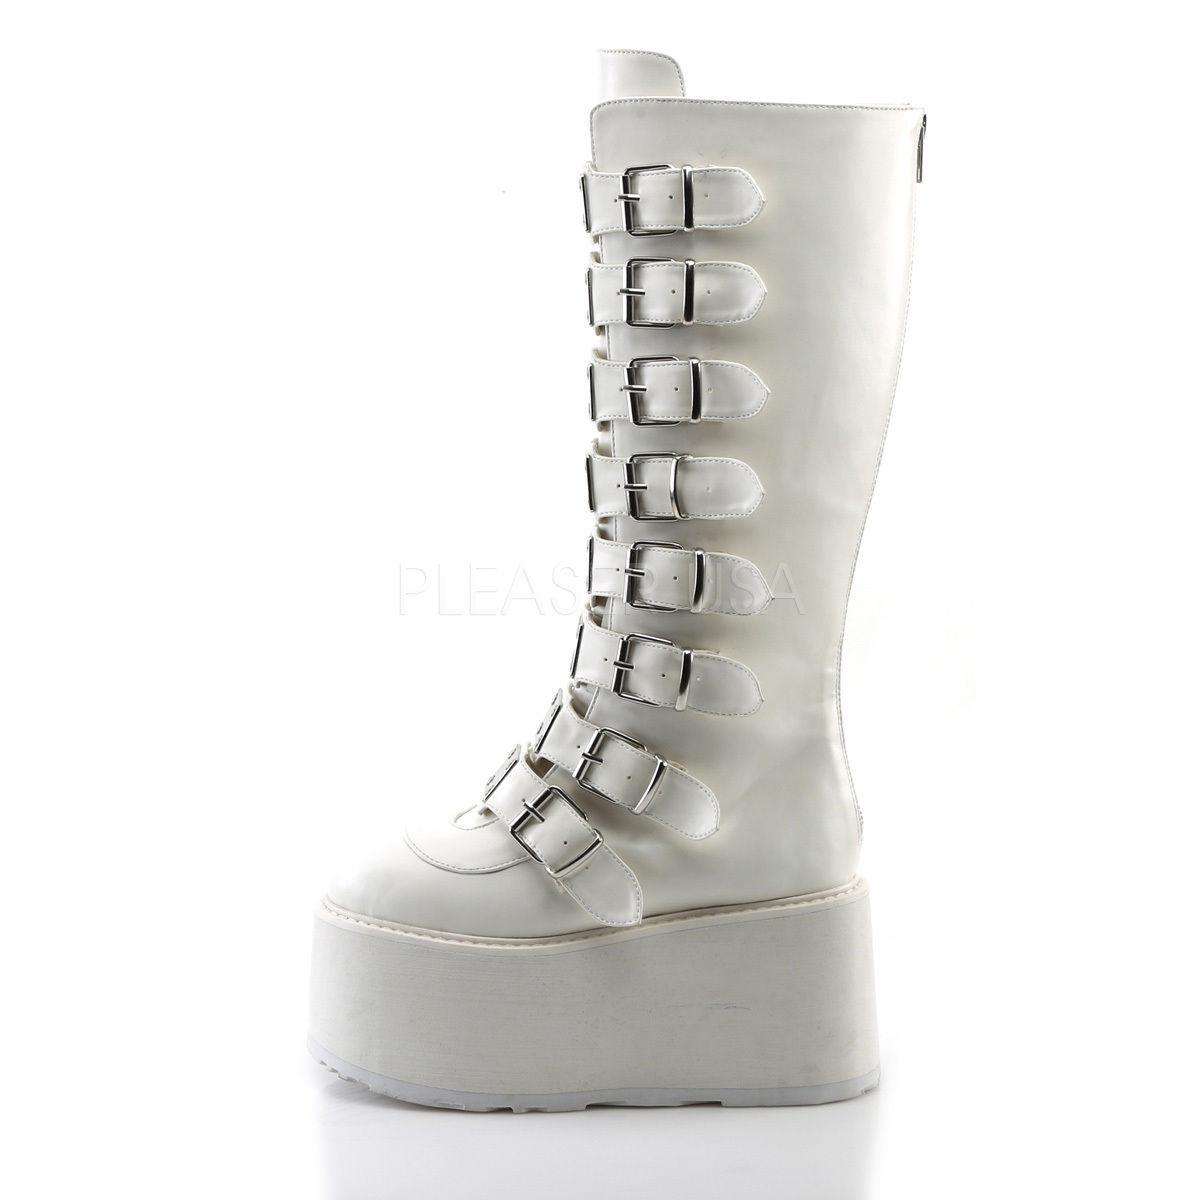 e5641140e973 DEMONIA DAMNED-318 Punk Gothic Buckle Strap White Platform Women s Knee  Boots